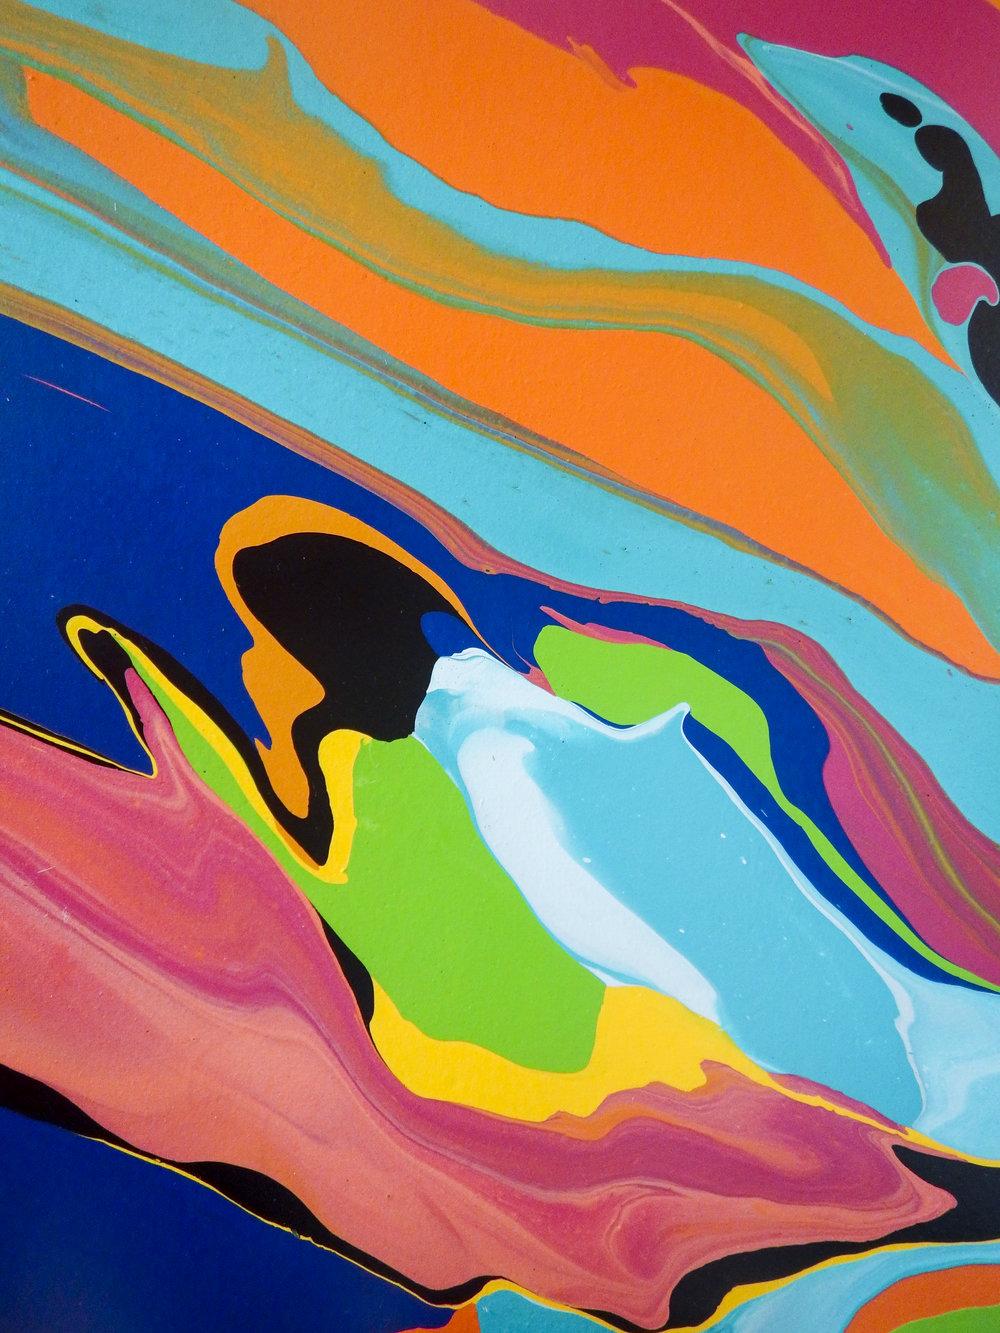 22 x 28  Latex Paint on Canvas  2018